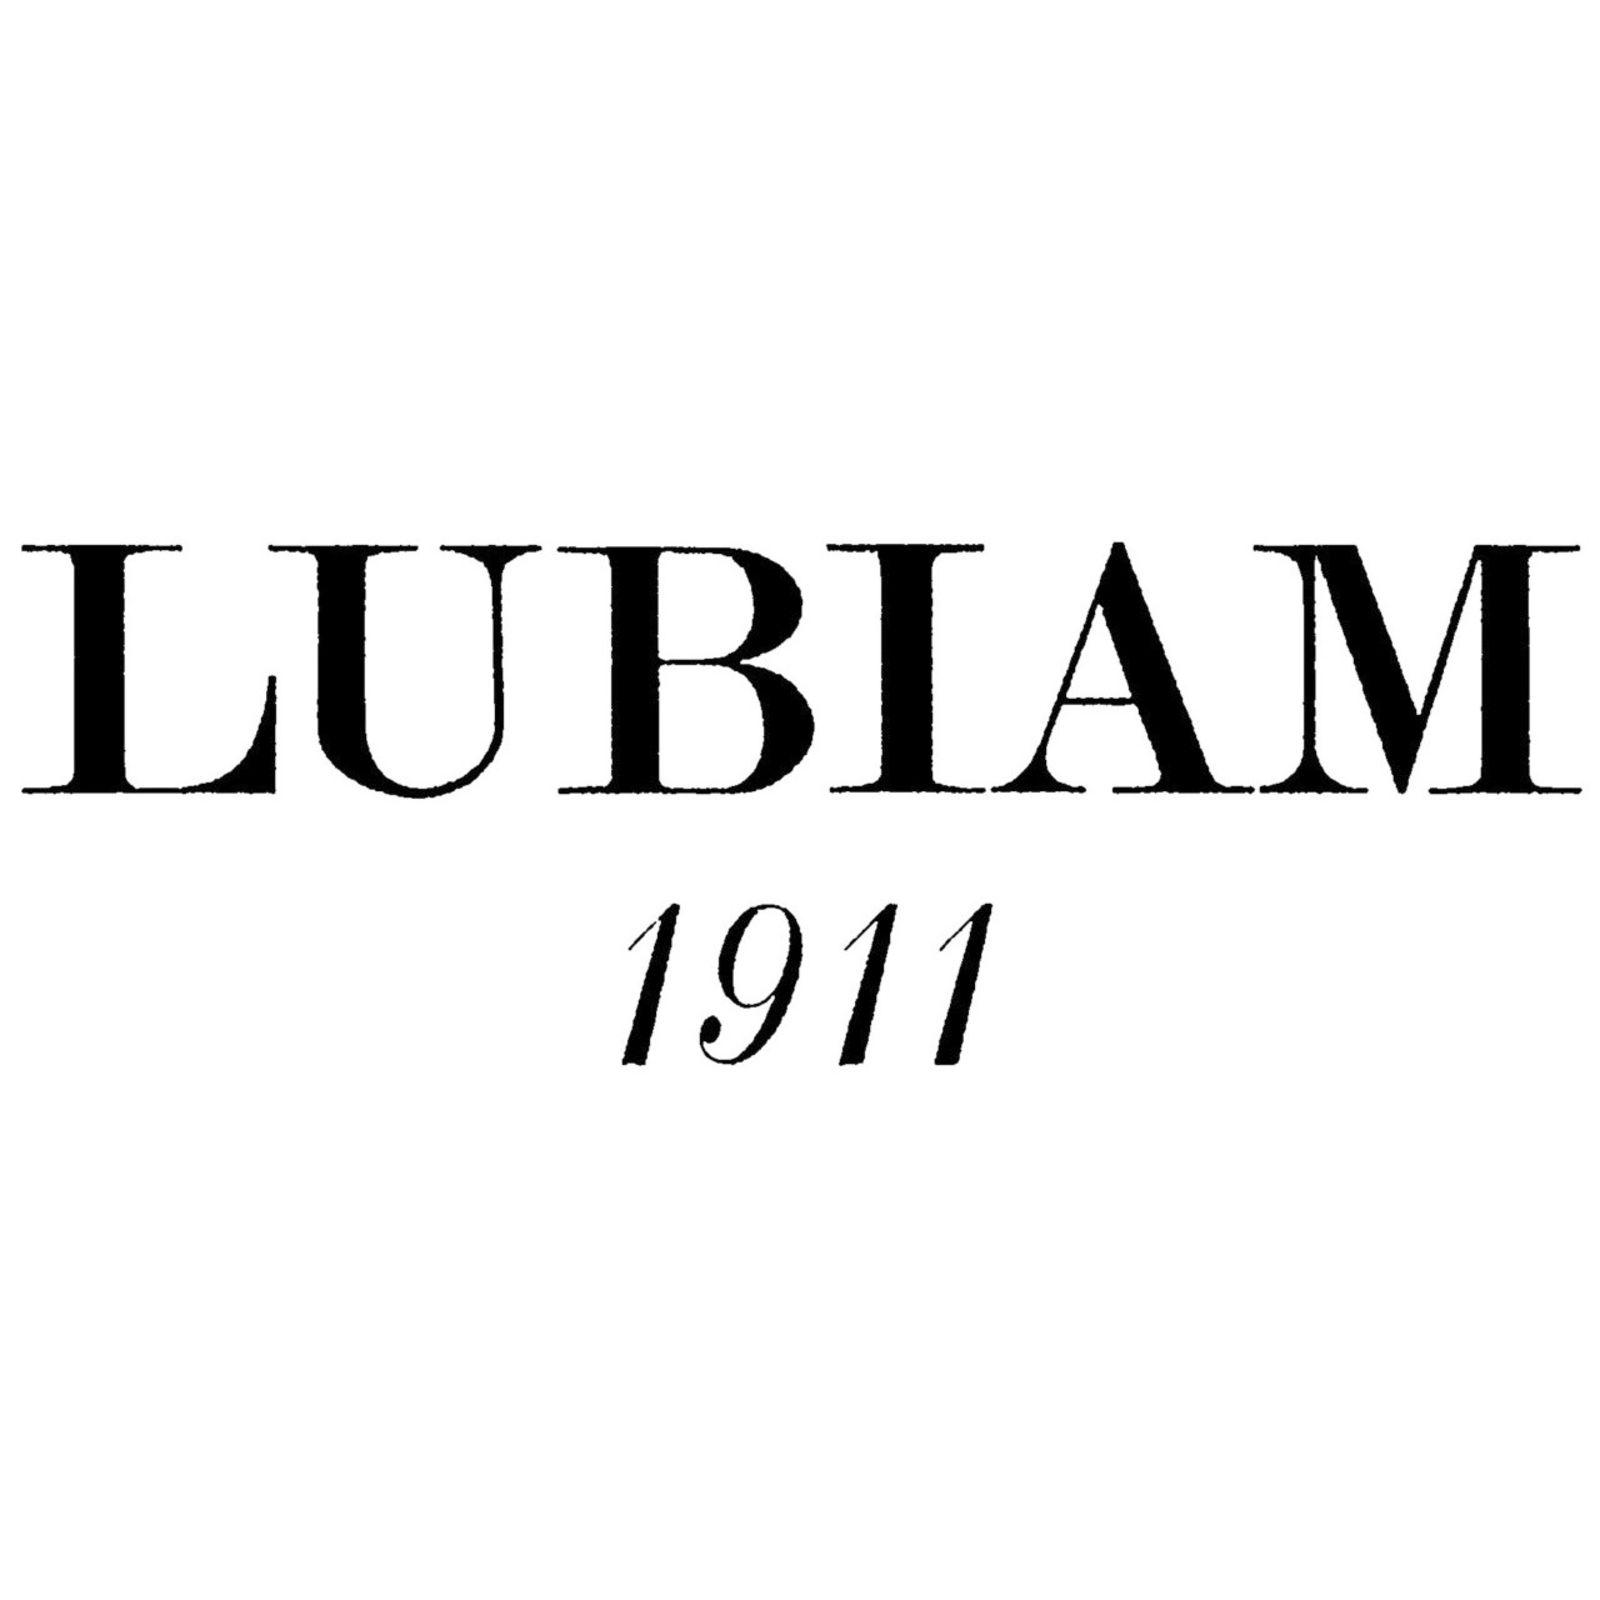 LUBIAM 1911